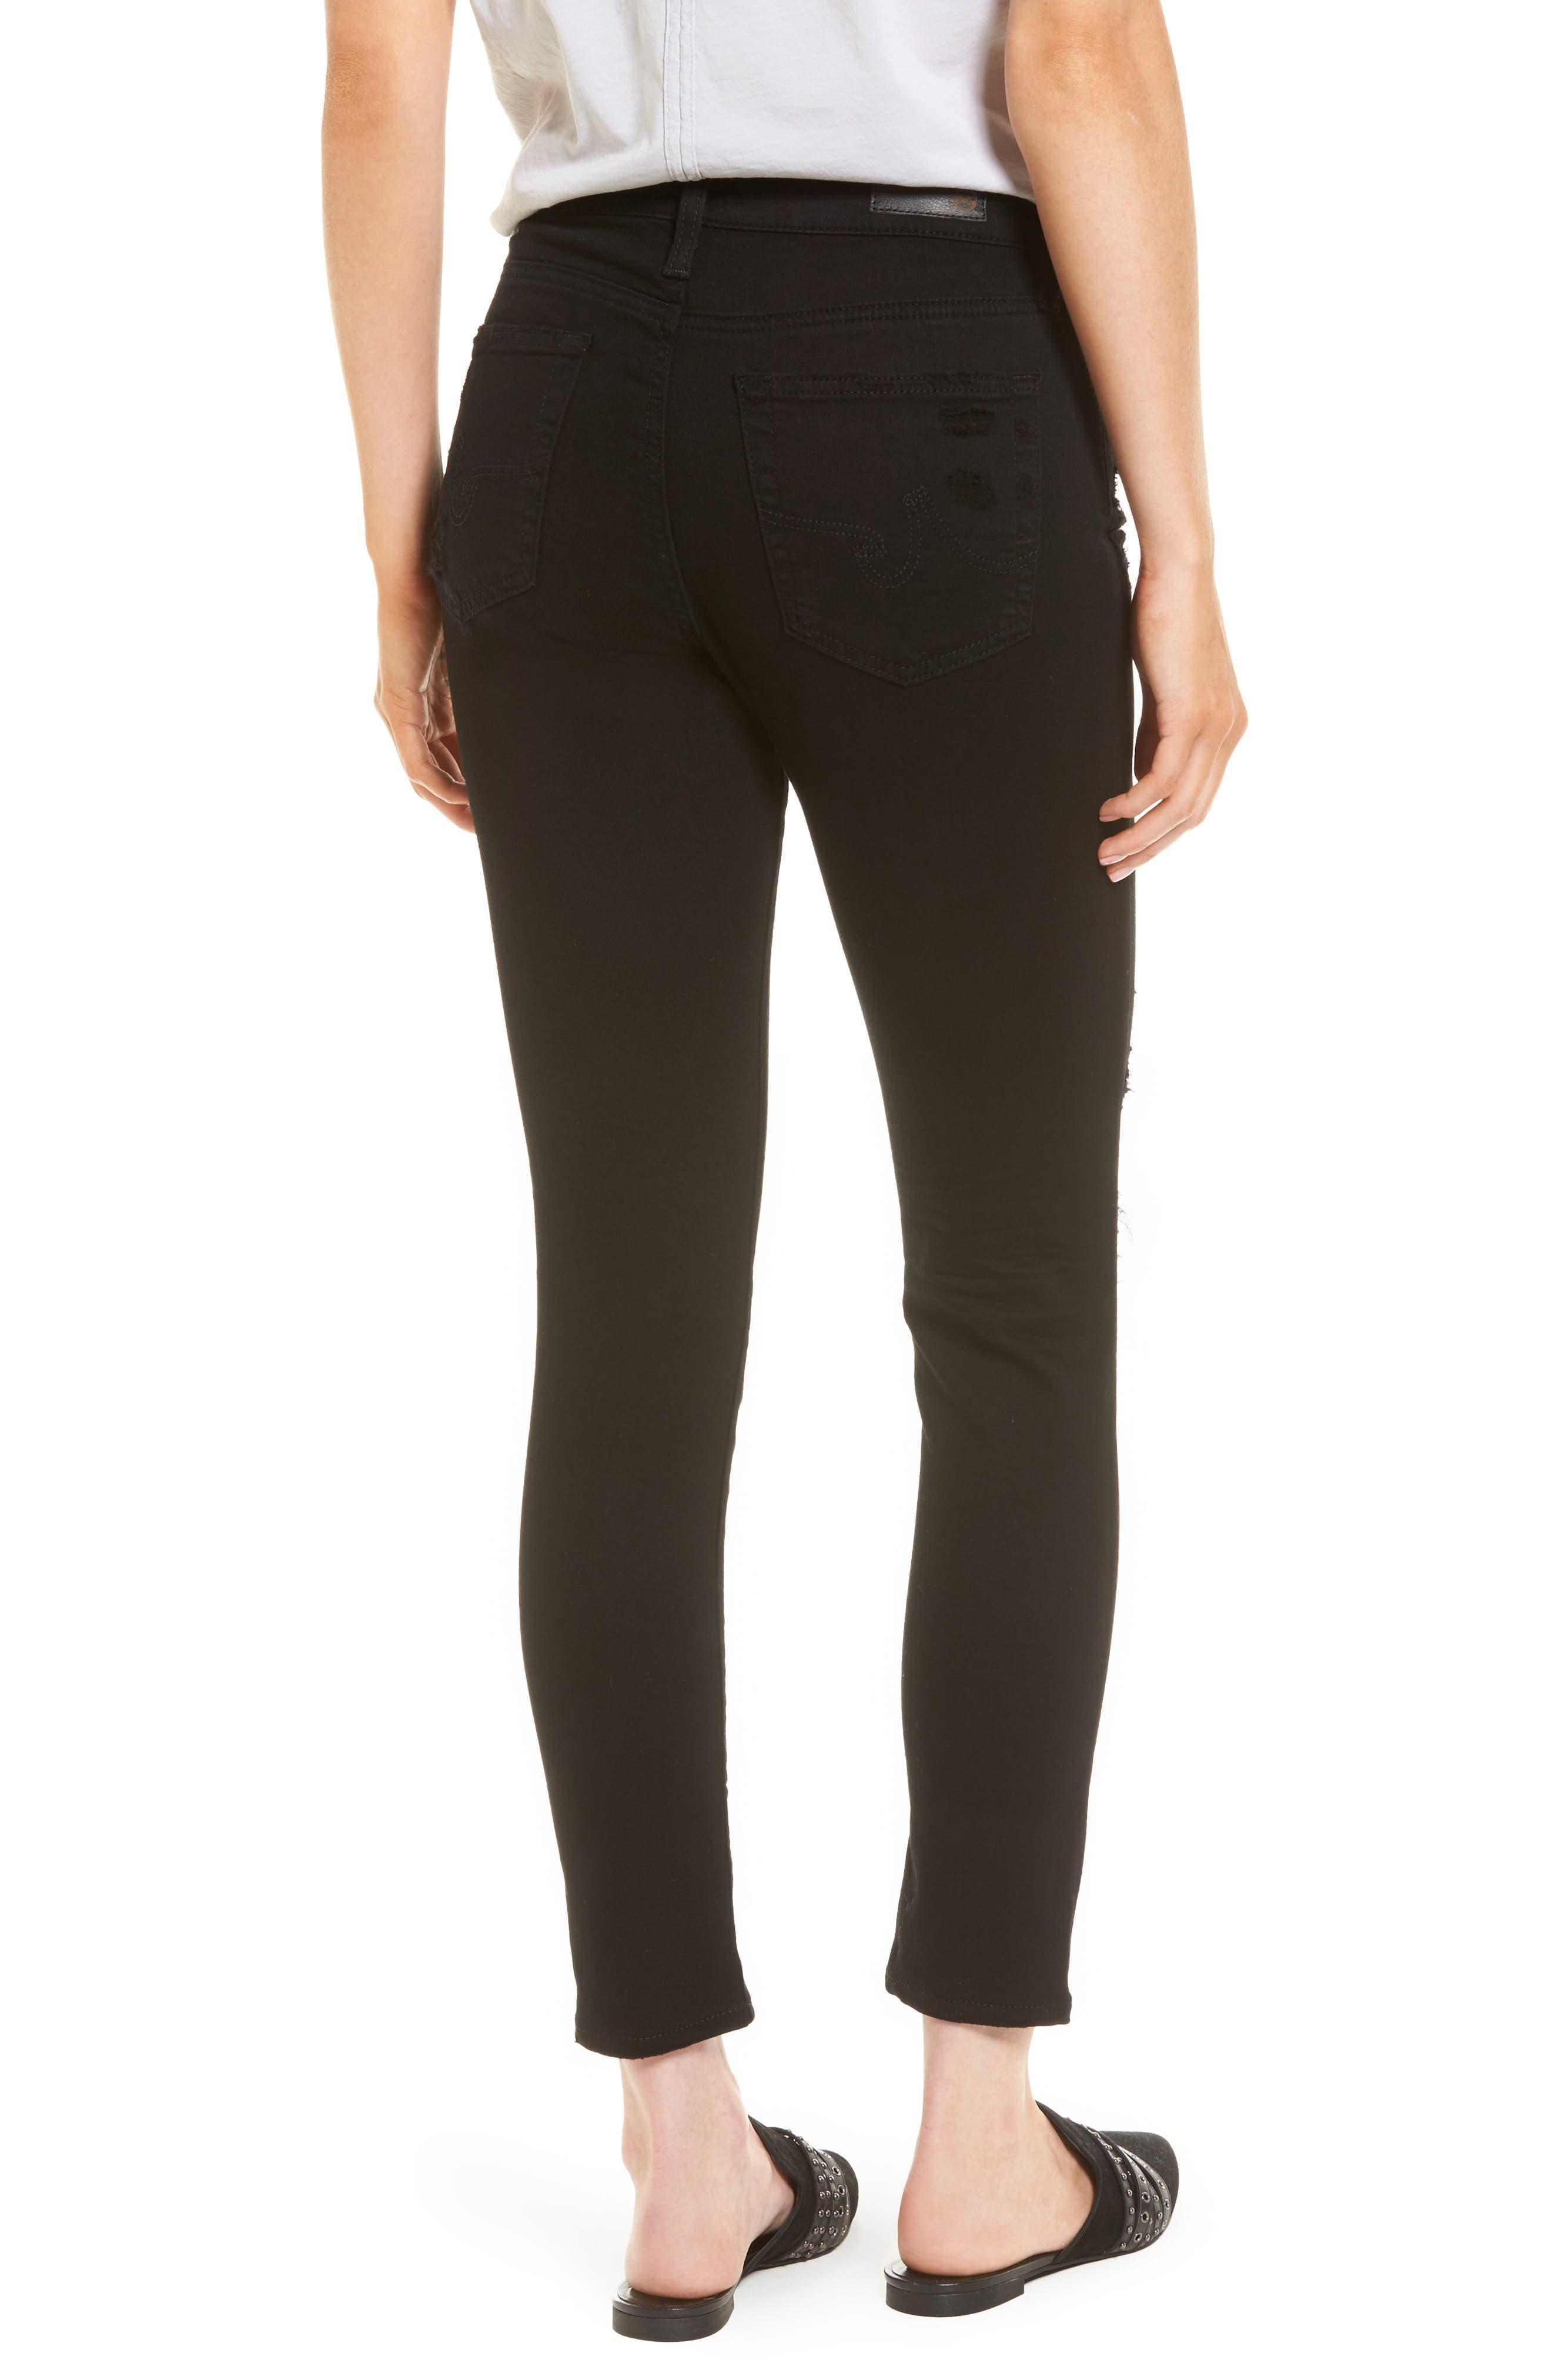 Alternate Image 2  - AG The Farrah High Waist Ankle Skinny Faux Leather Pants